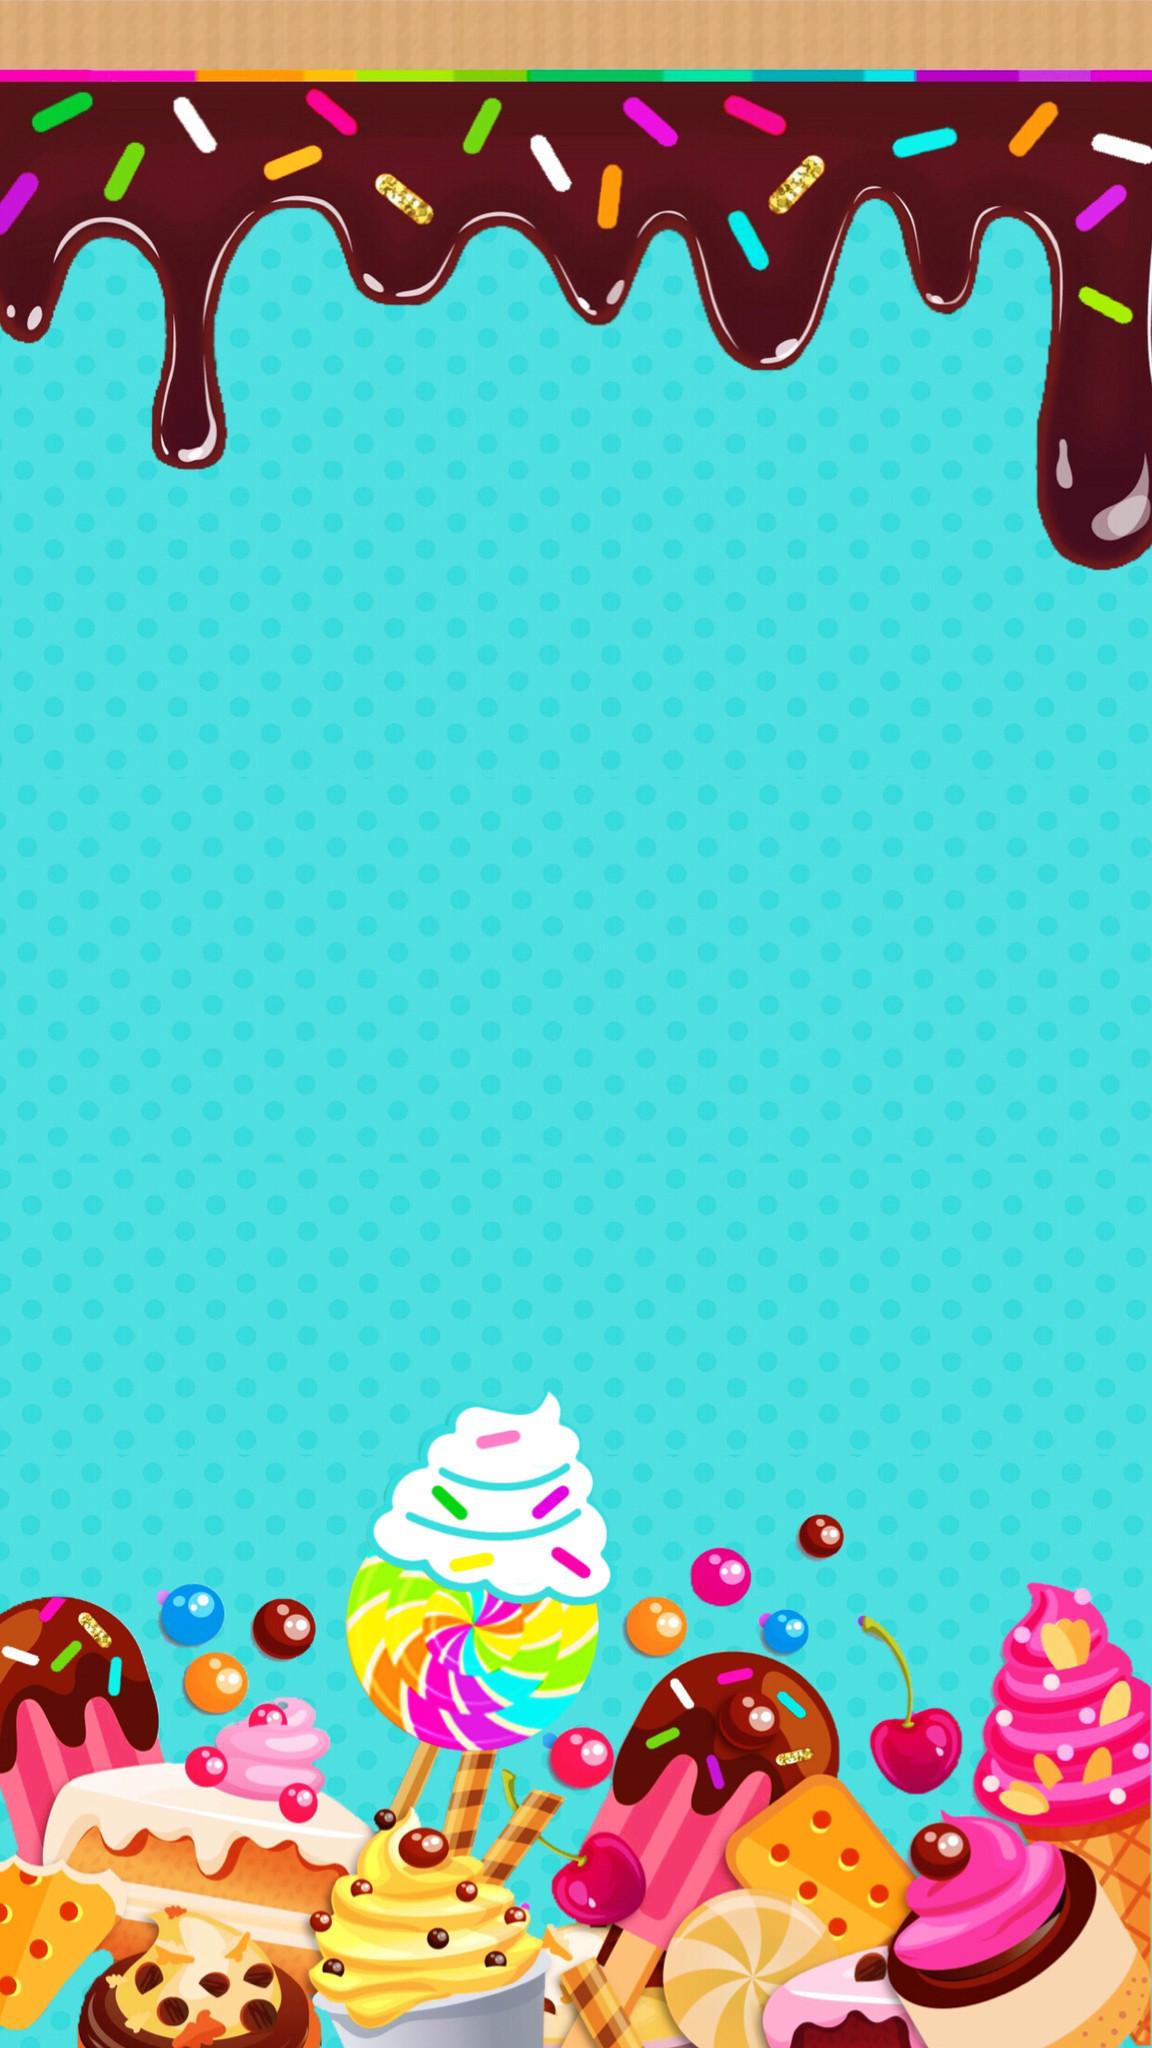 Res: 1152x2048, Dropbox - Sweet Treats. Food WallpaperKawaii WallpaperWallpaper Backgrounds Cute ...